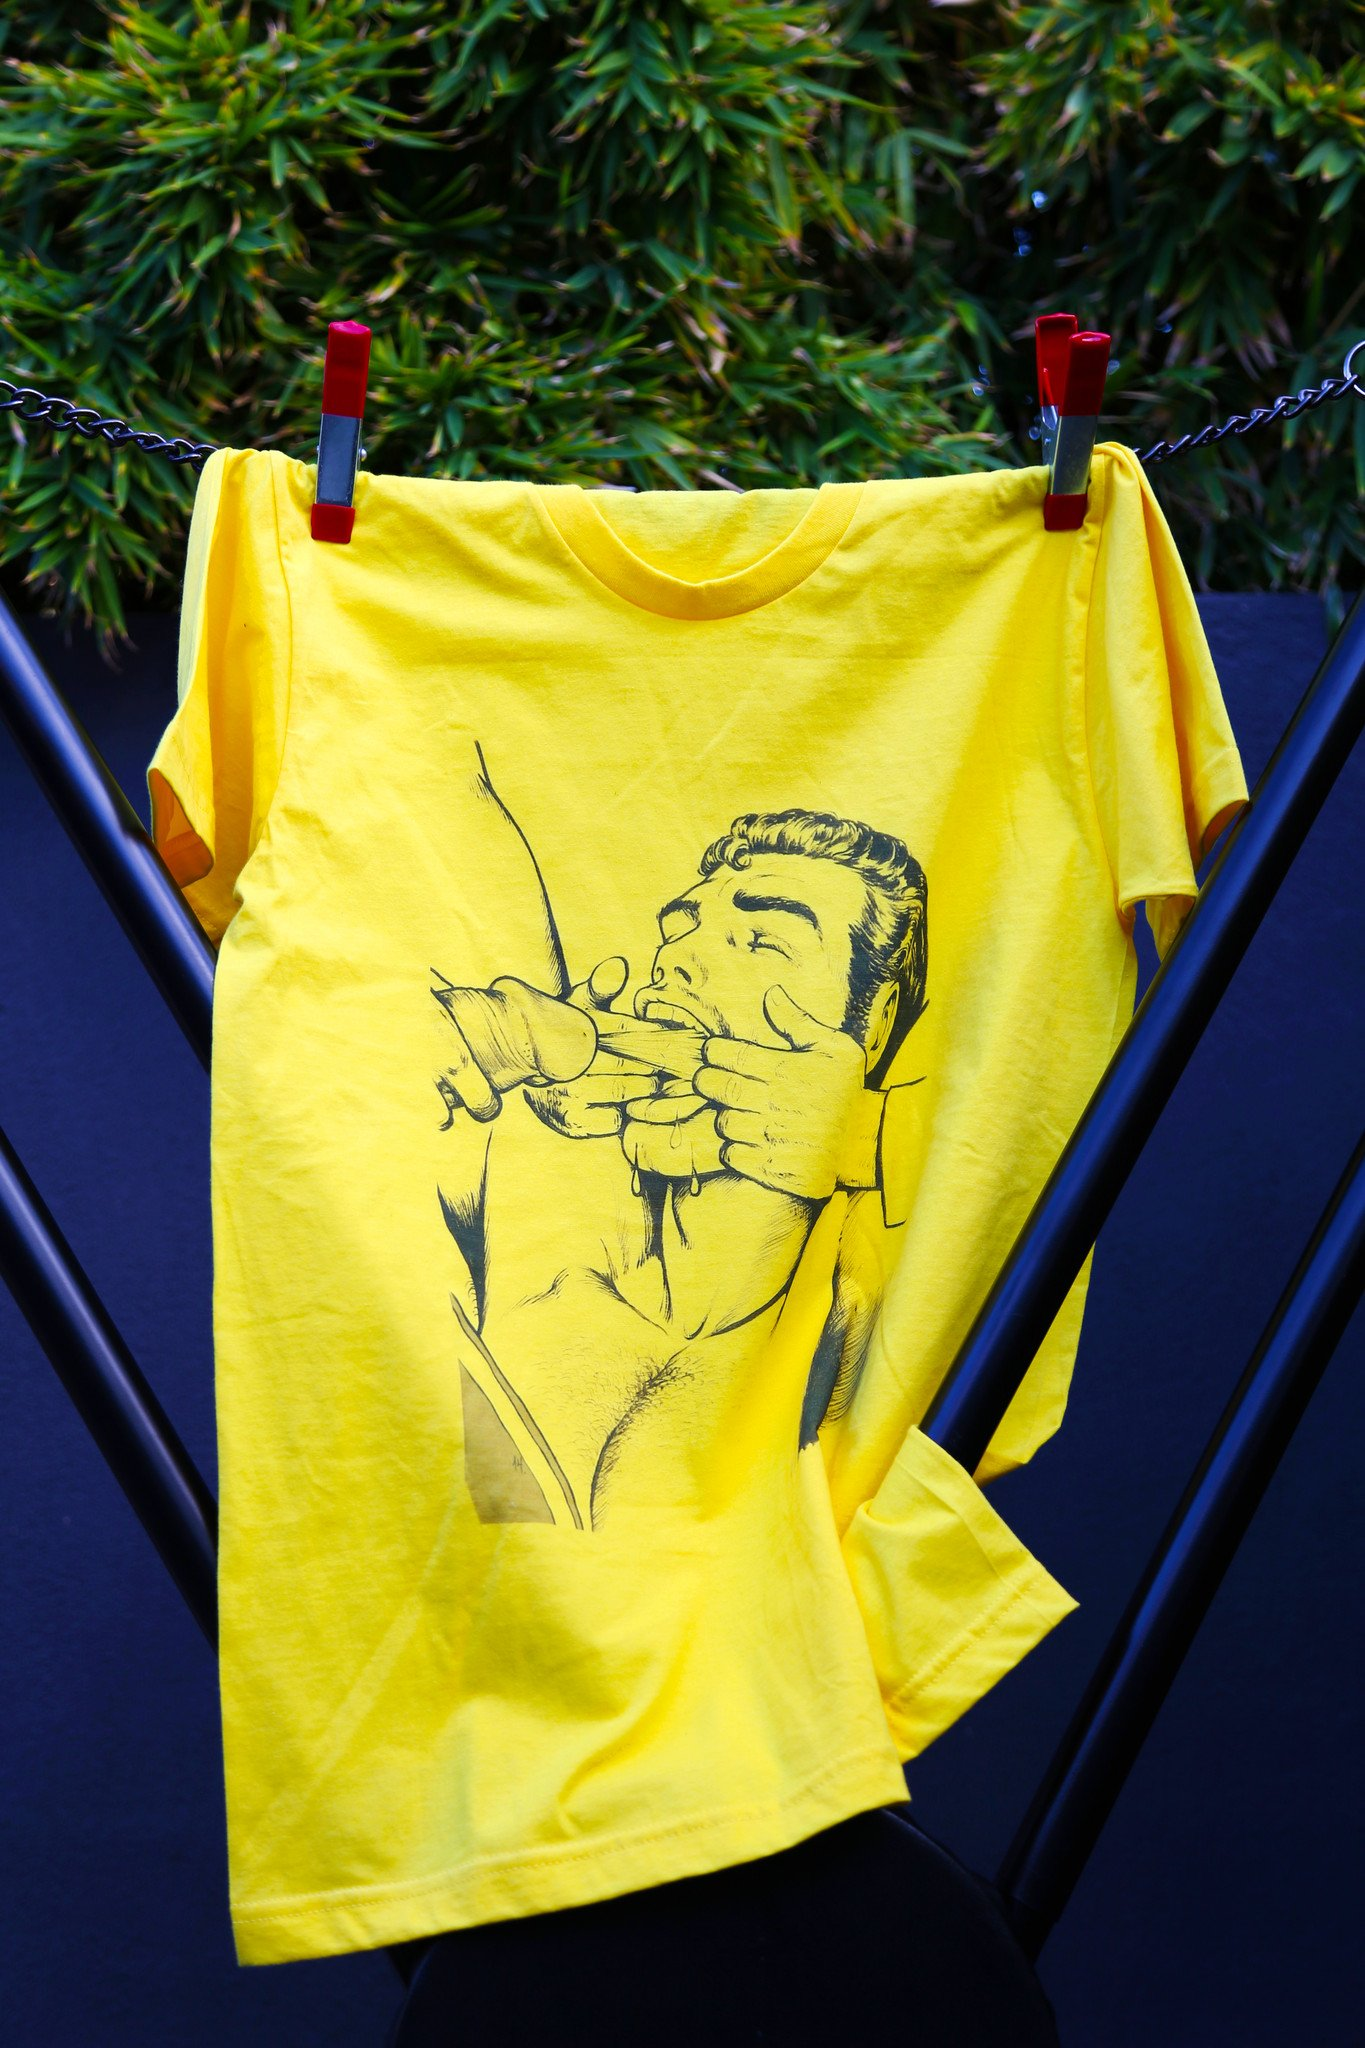 tom of finland shirt